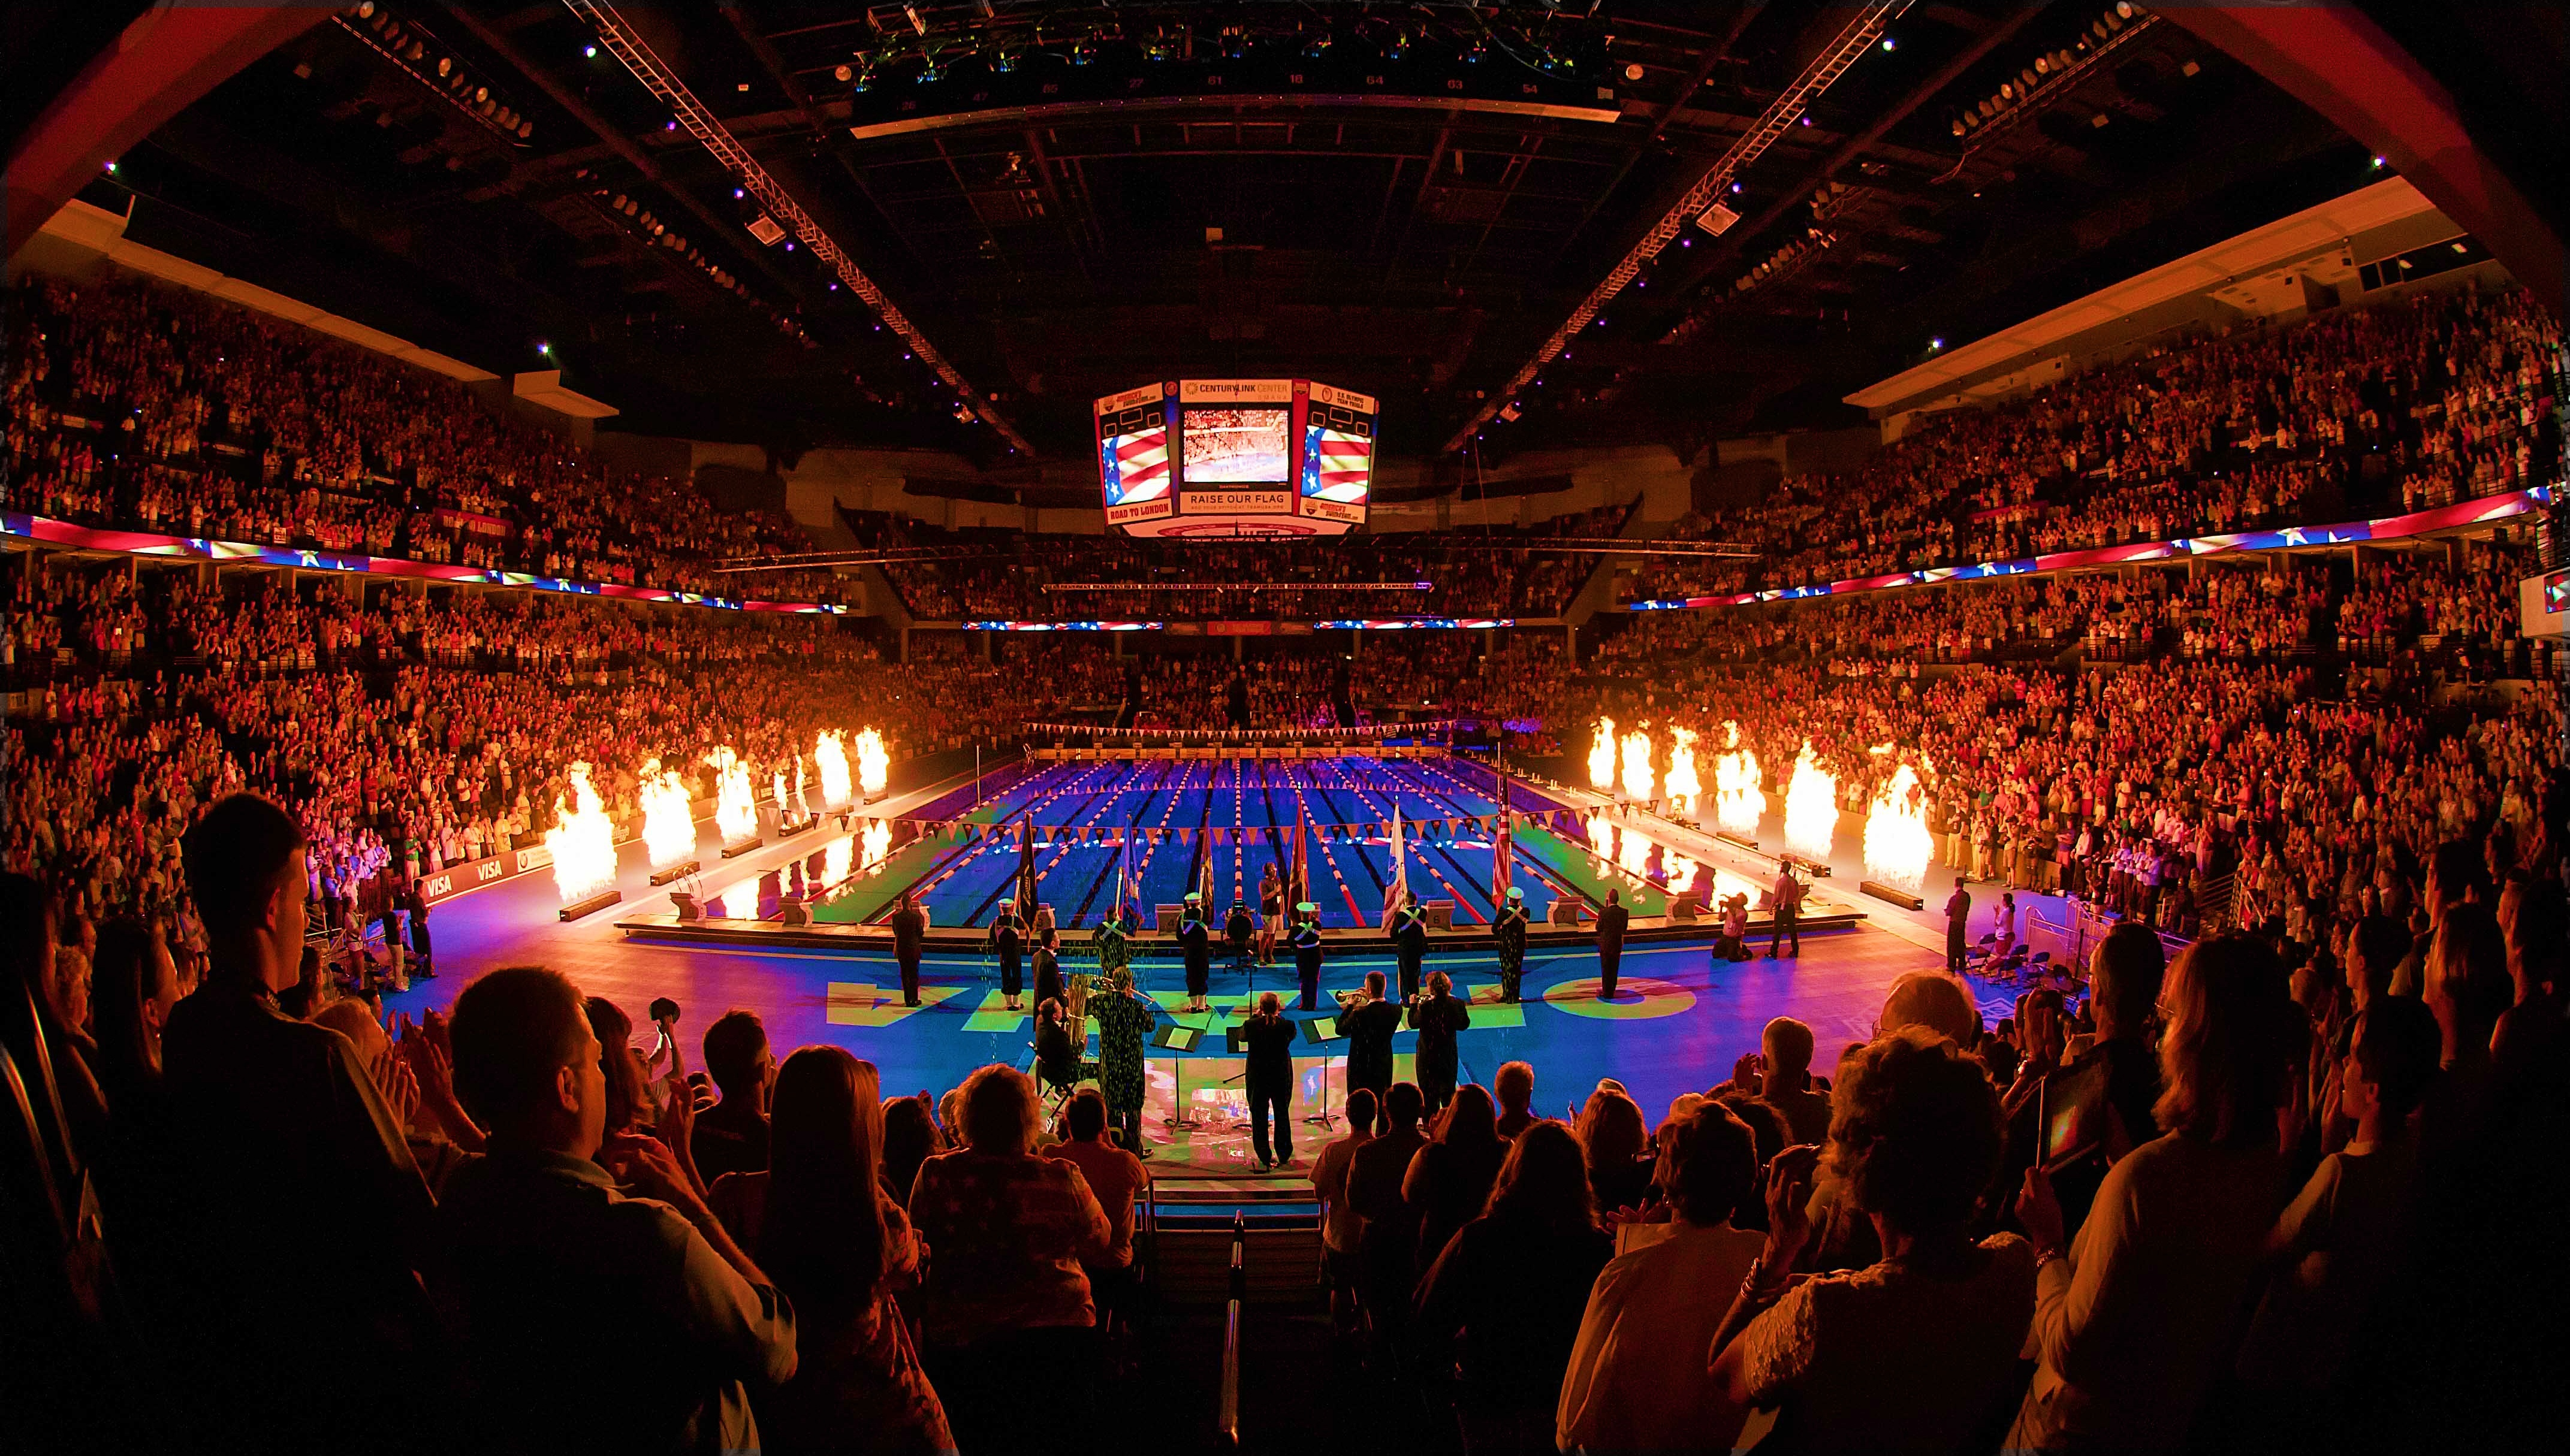 Olympics_Swim_Stadium_Filtered-1.jpg